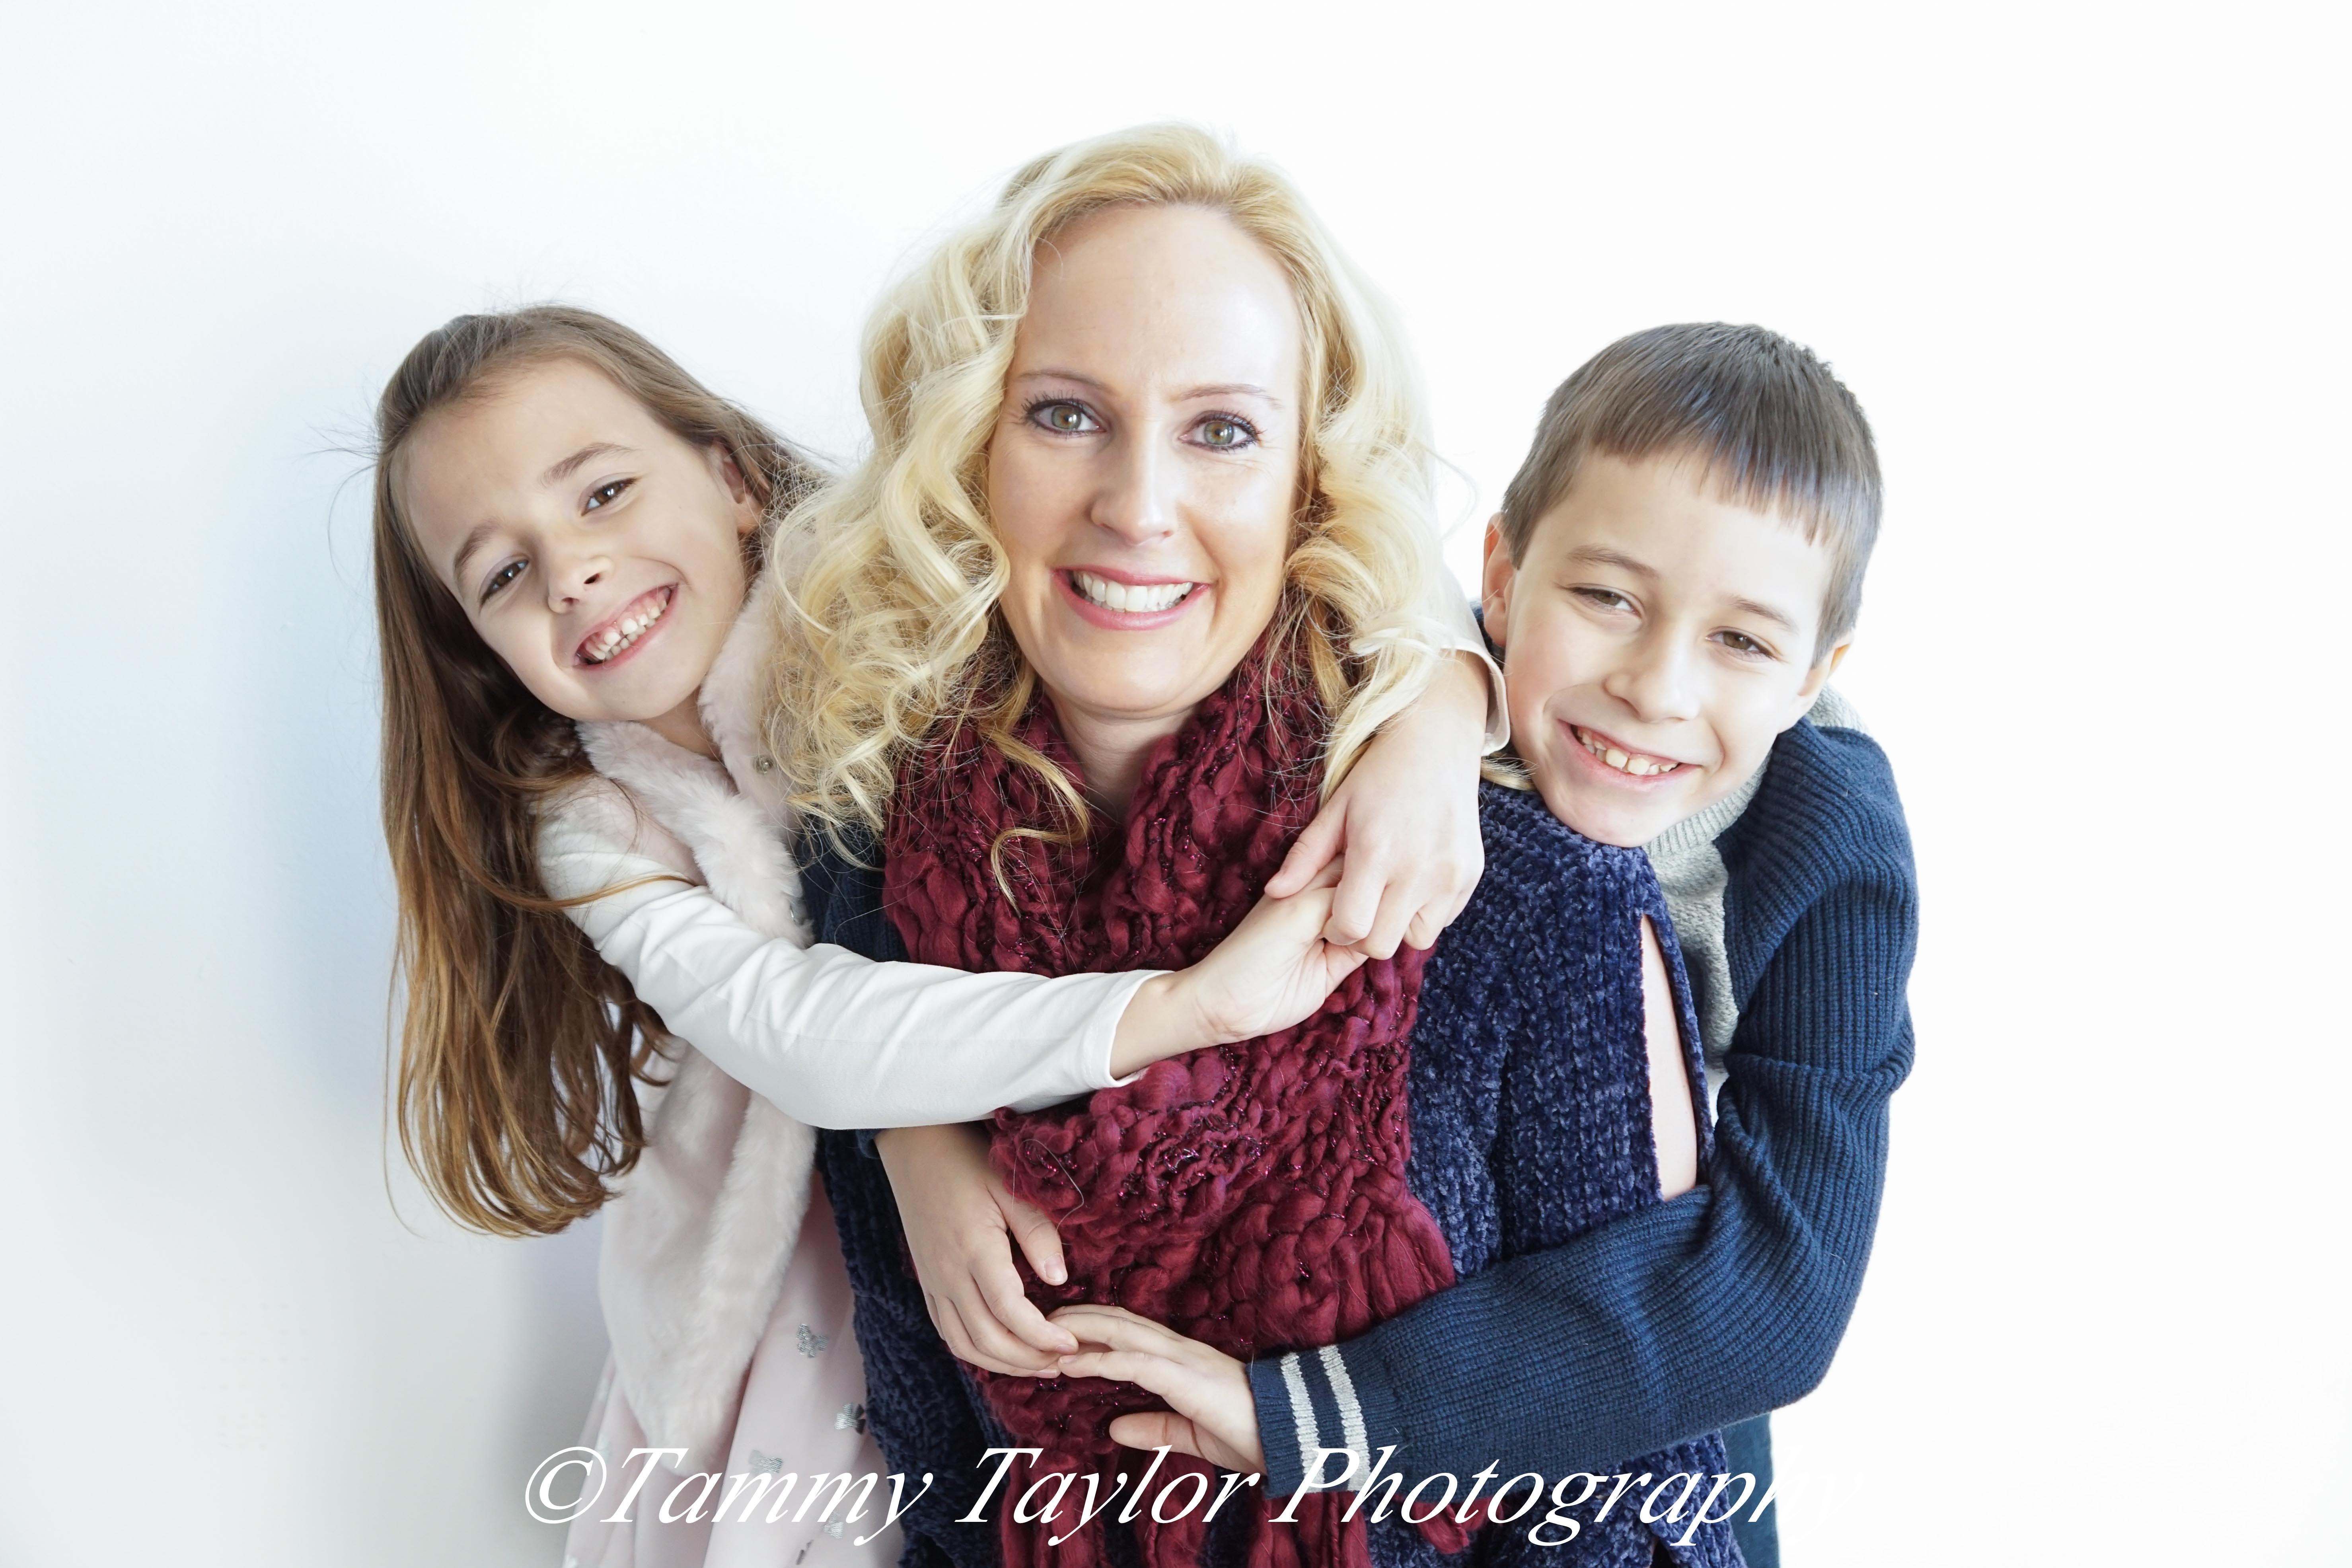 Tricia & Kids-16